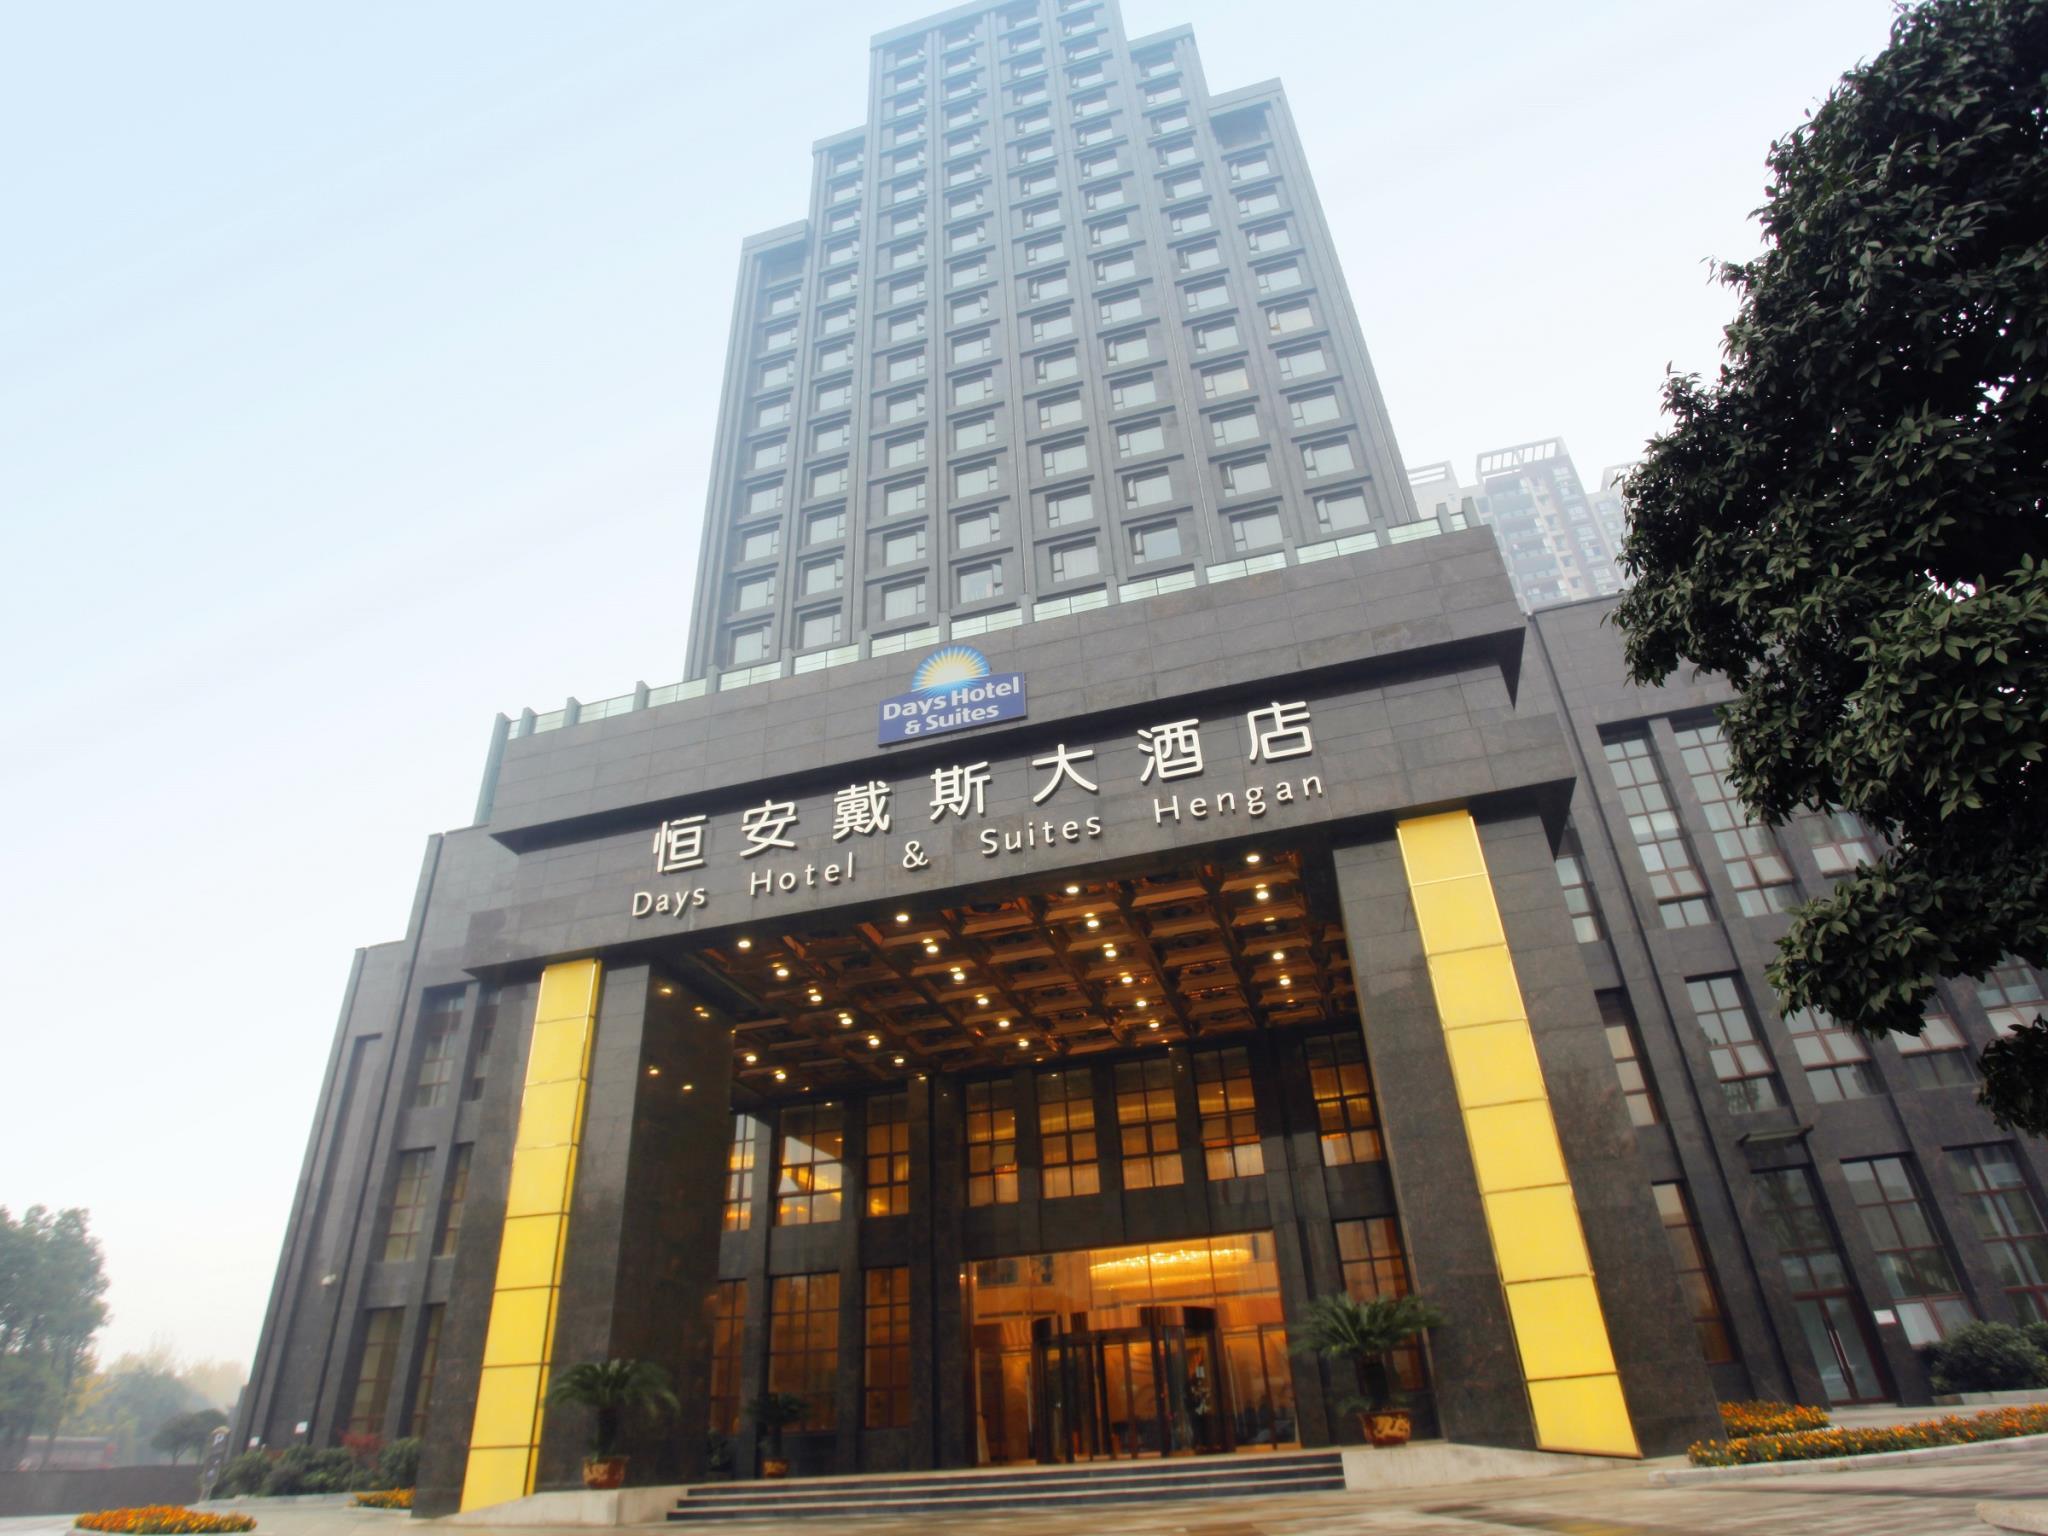 Days Hotel And Suites Hengan Chongqing